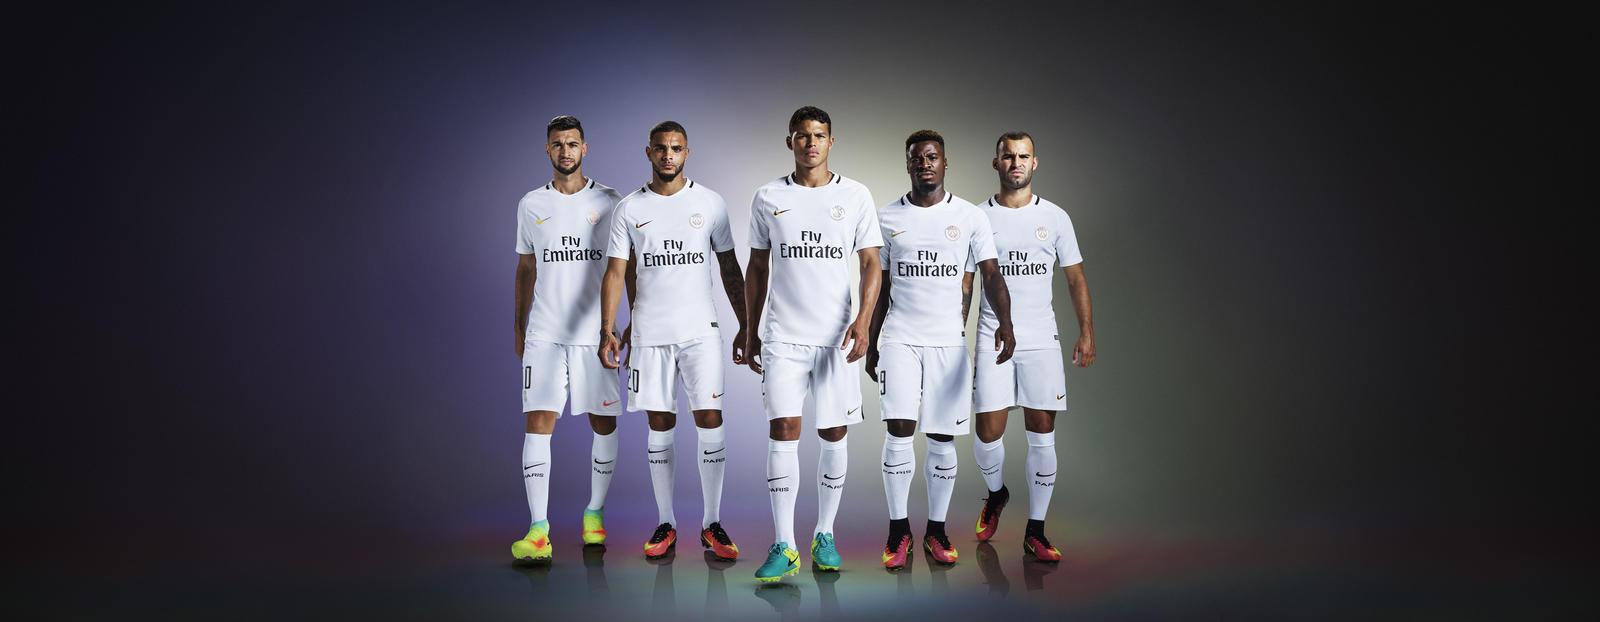 Nike, la terza maglia del Paris Saint-Germain